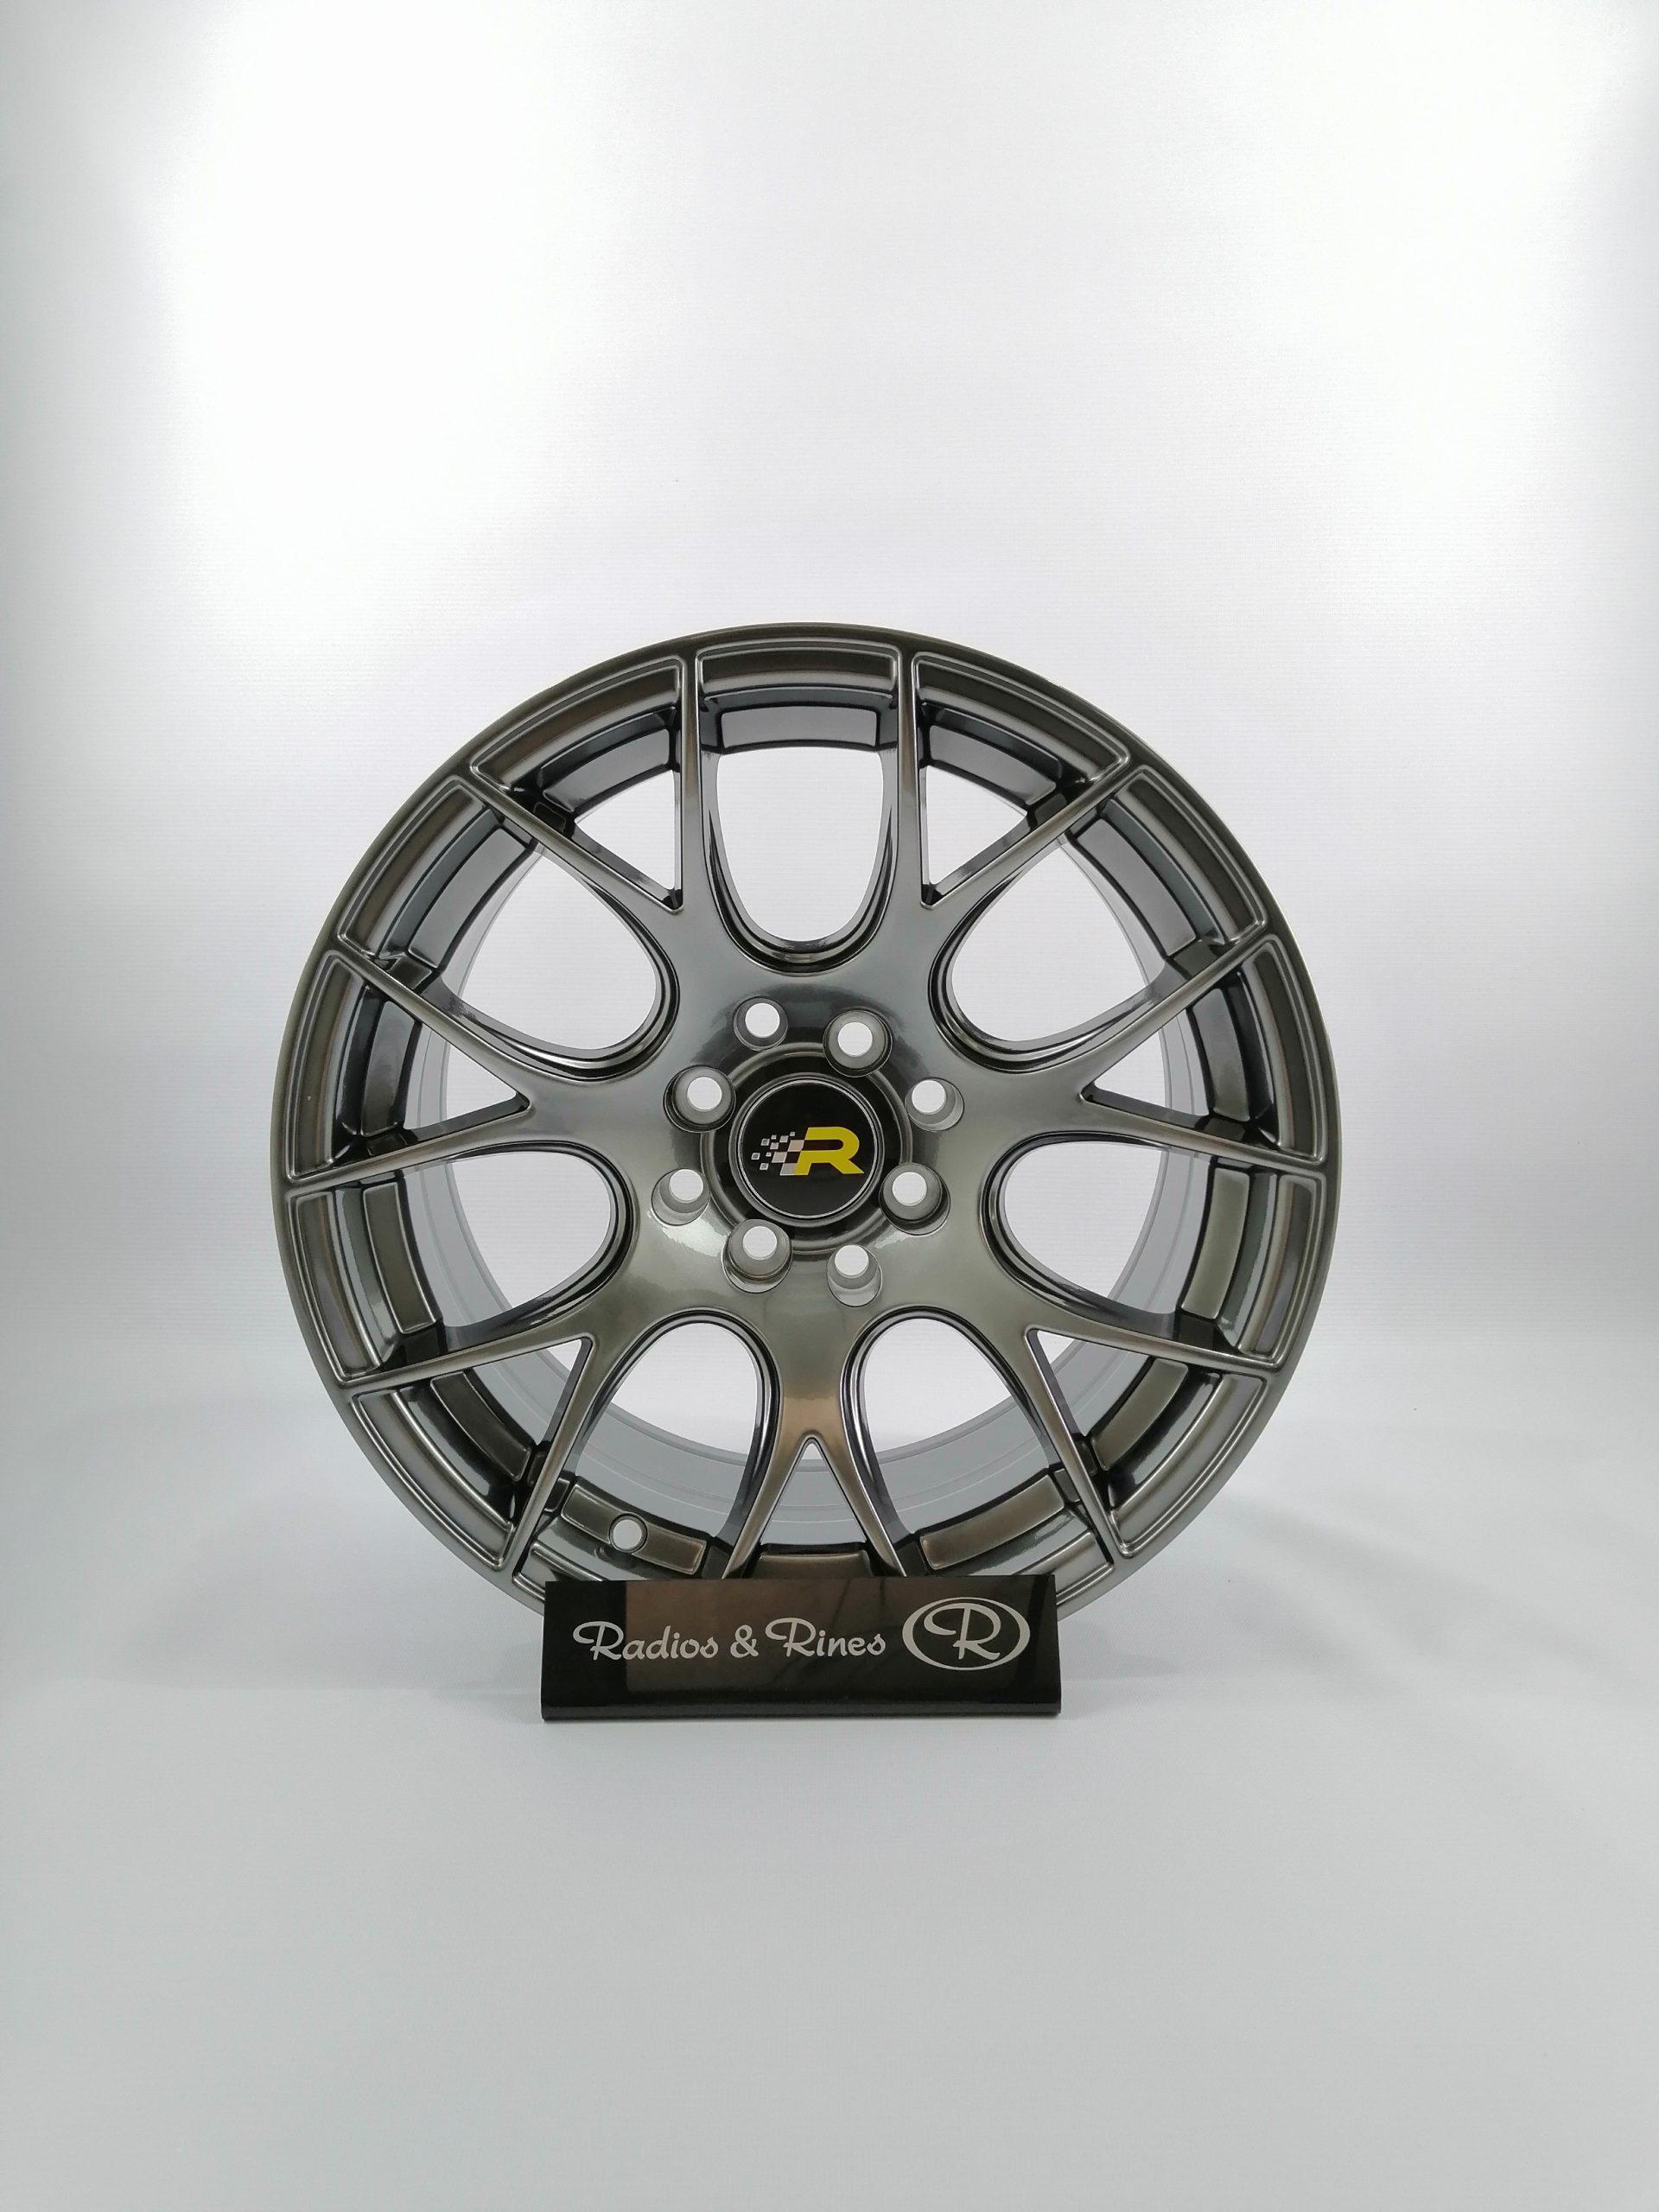 RIN RACER 192 R15X8.25 8H 100/114.3 GRIS HUMO BRILLANTE